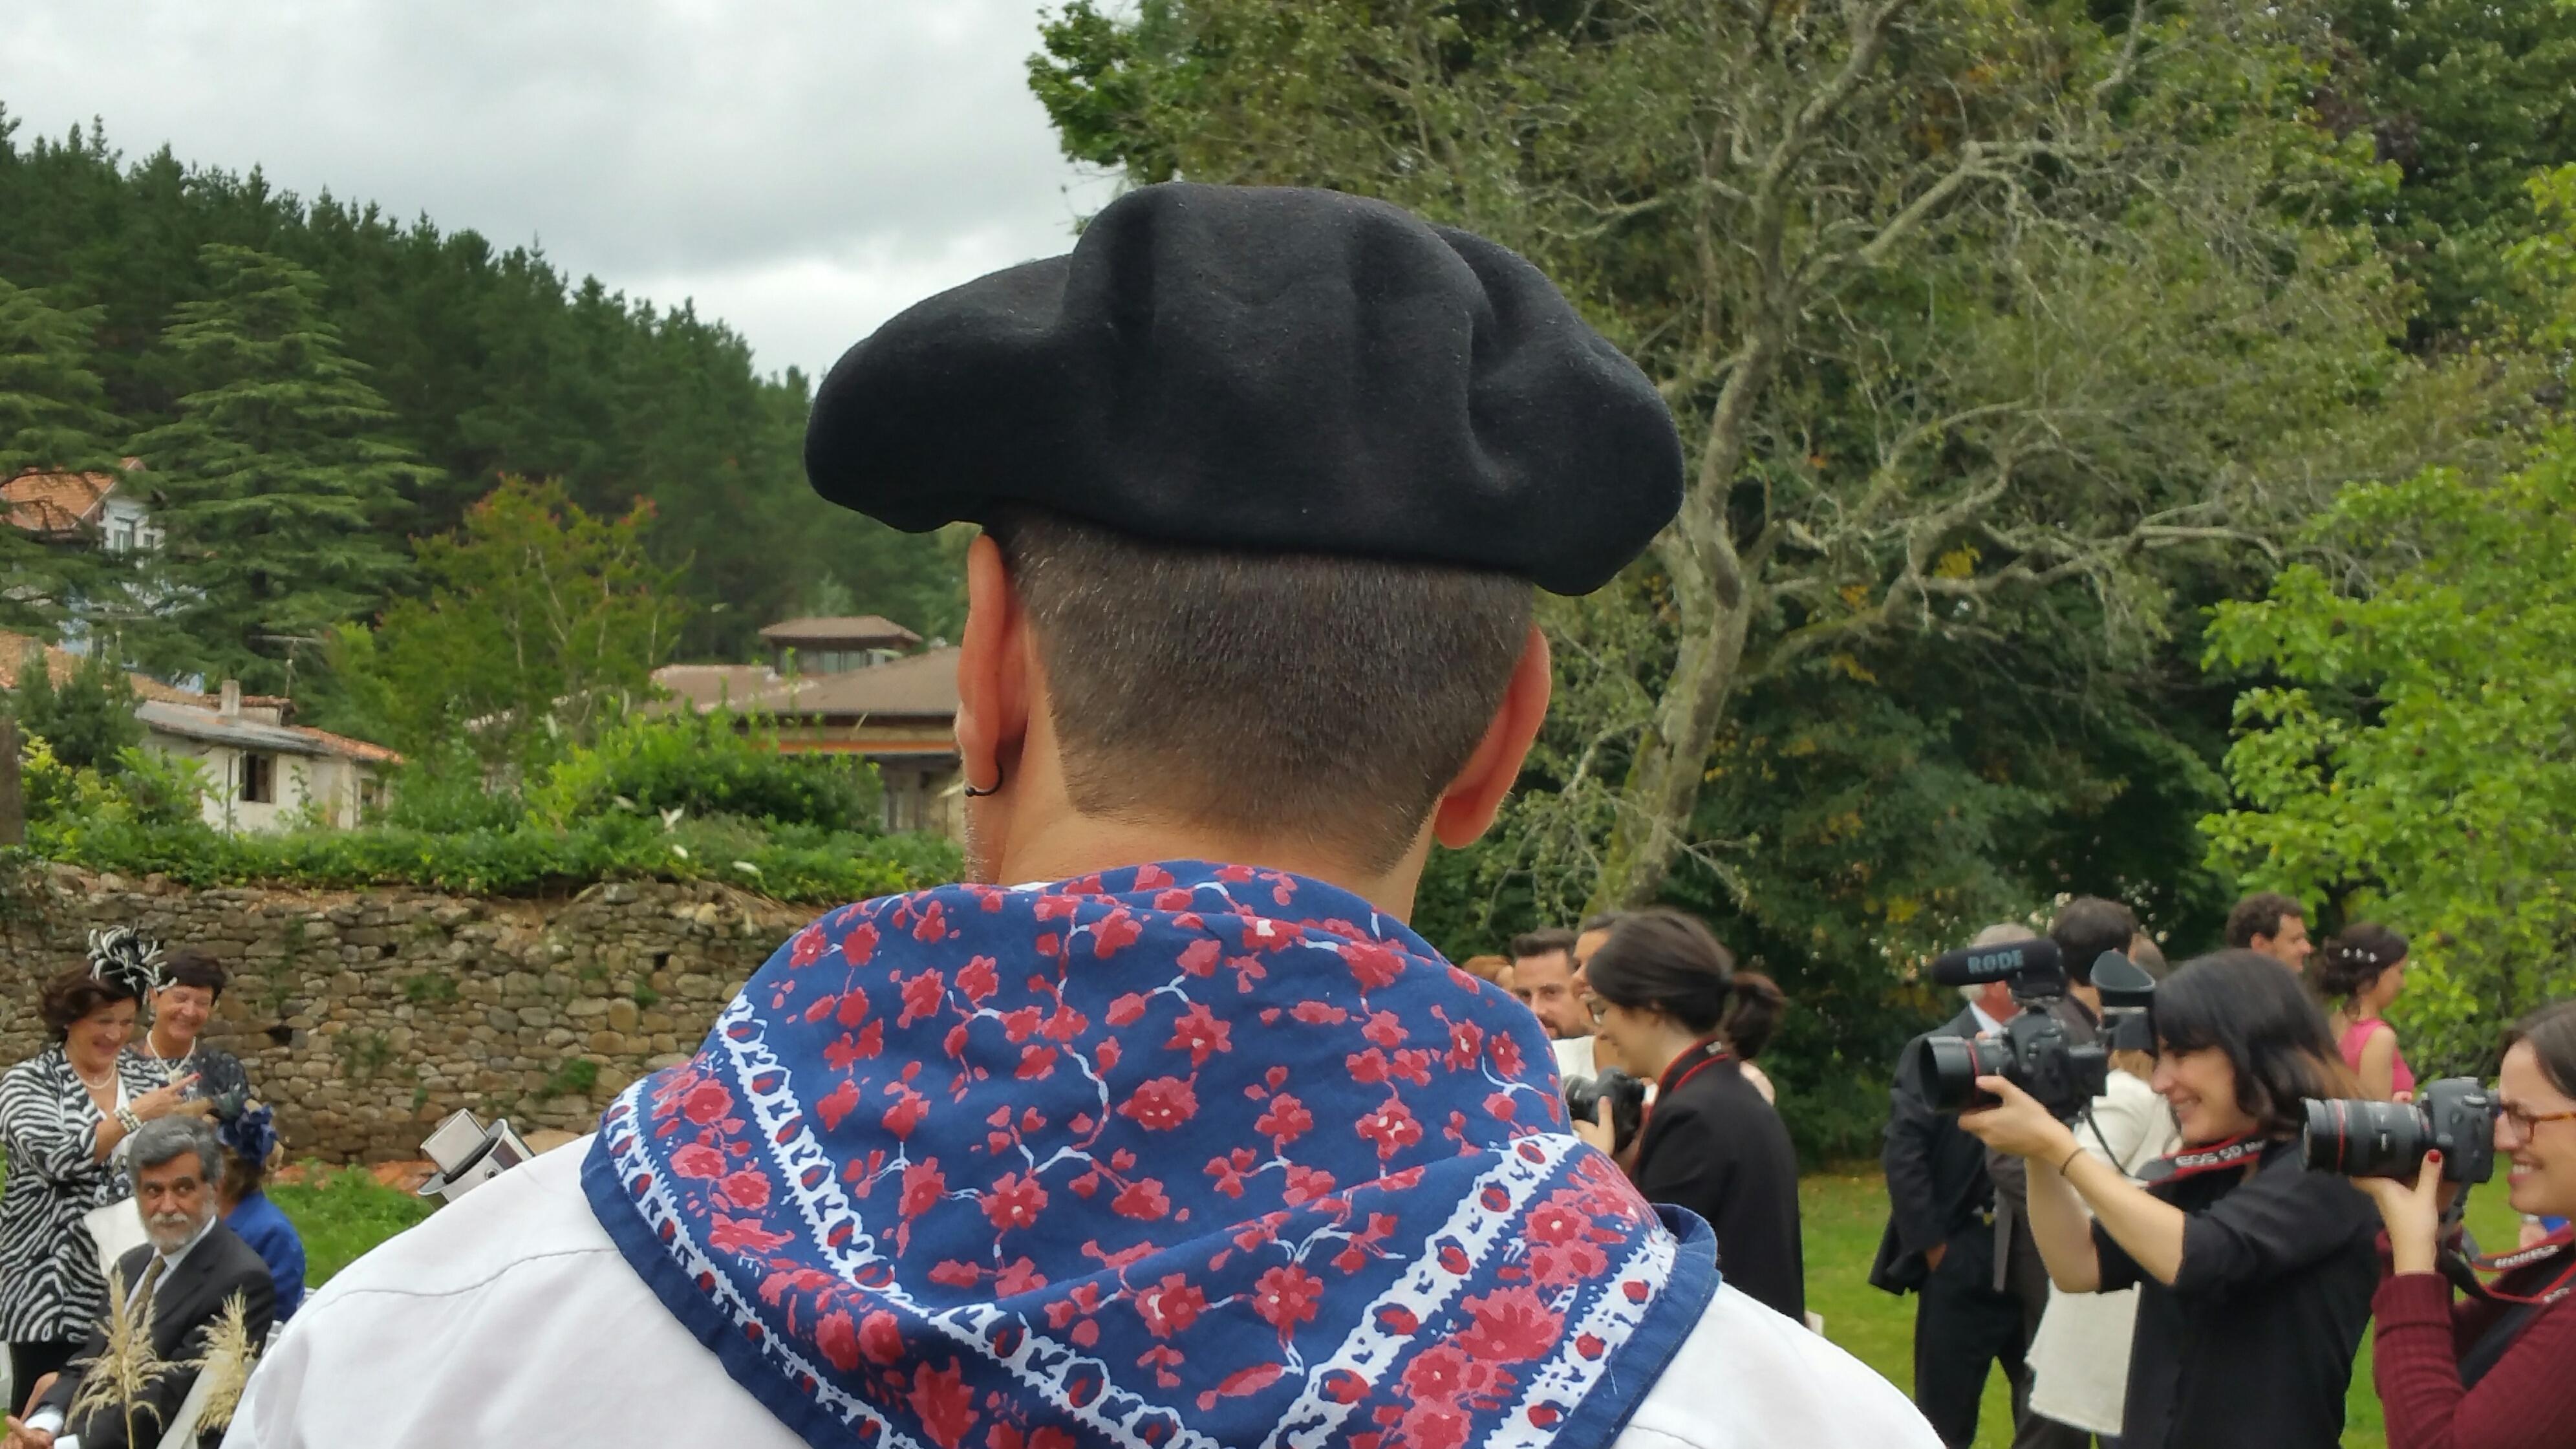 20 souvenirs típicos del País vasco.